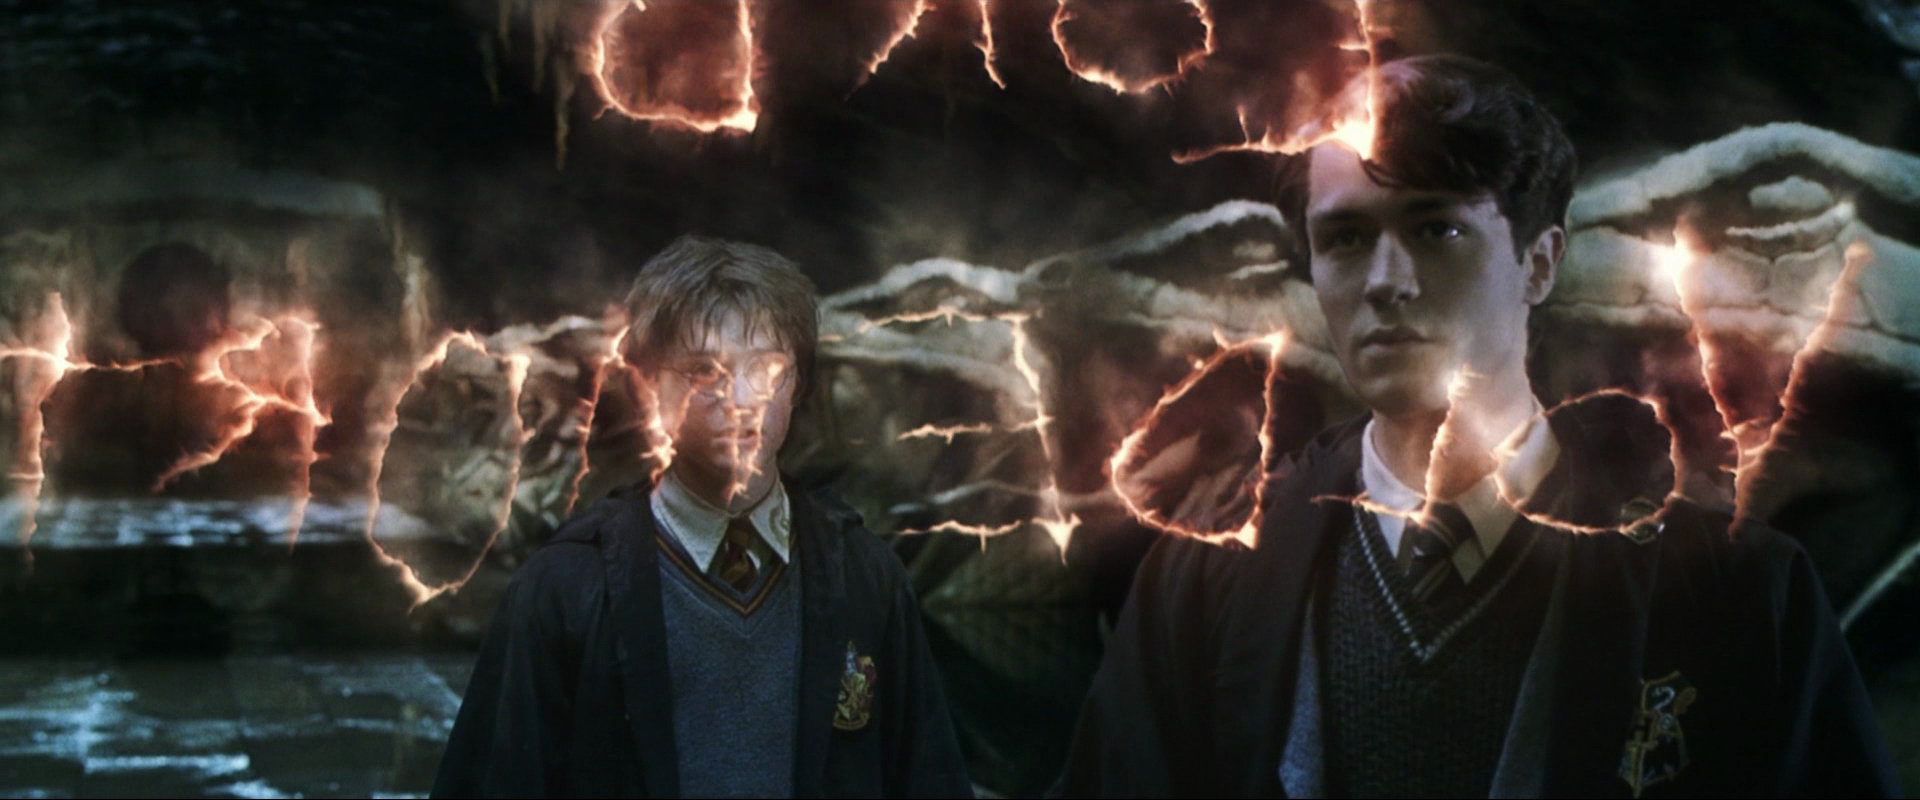 Image - Christian45.jpg | Harry Potter Wiki | FANDOM powered by Wikia